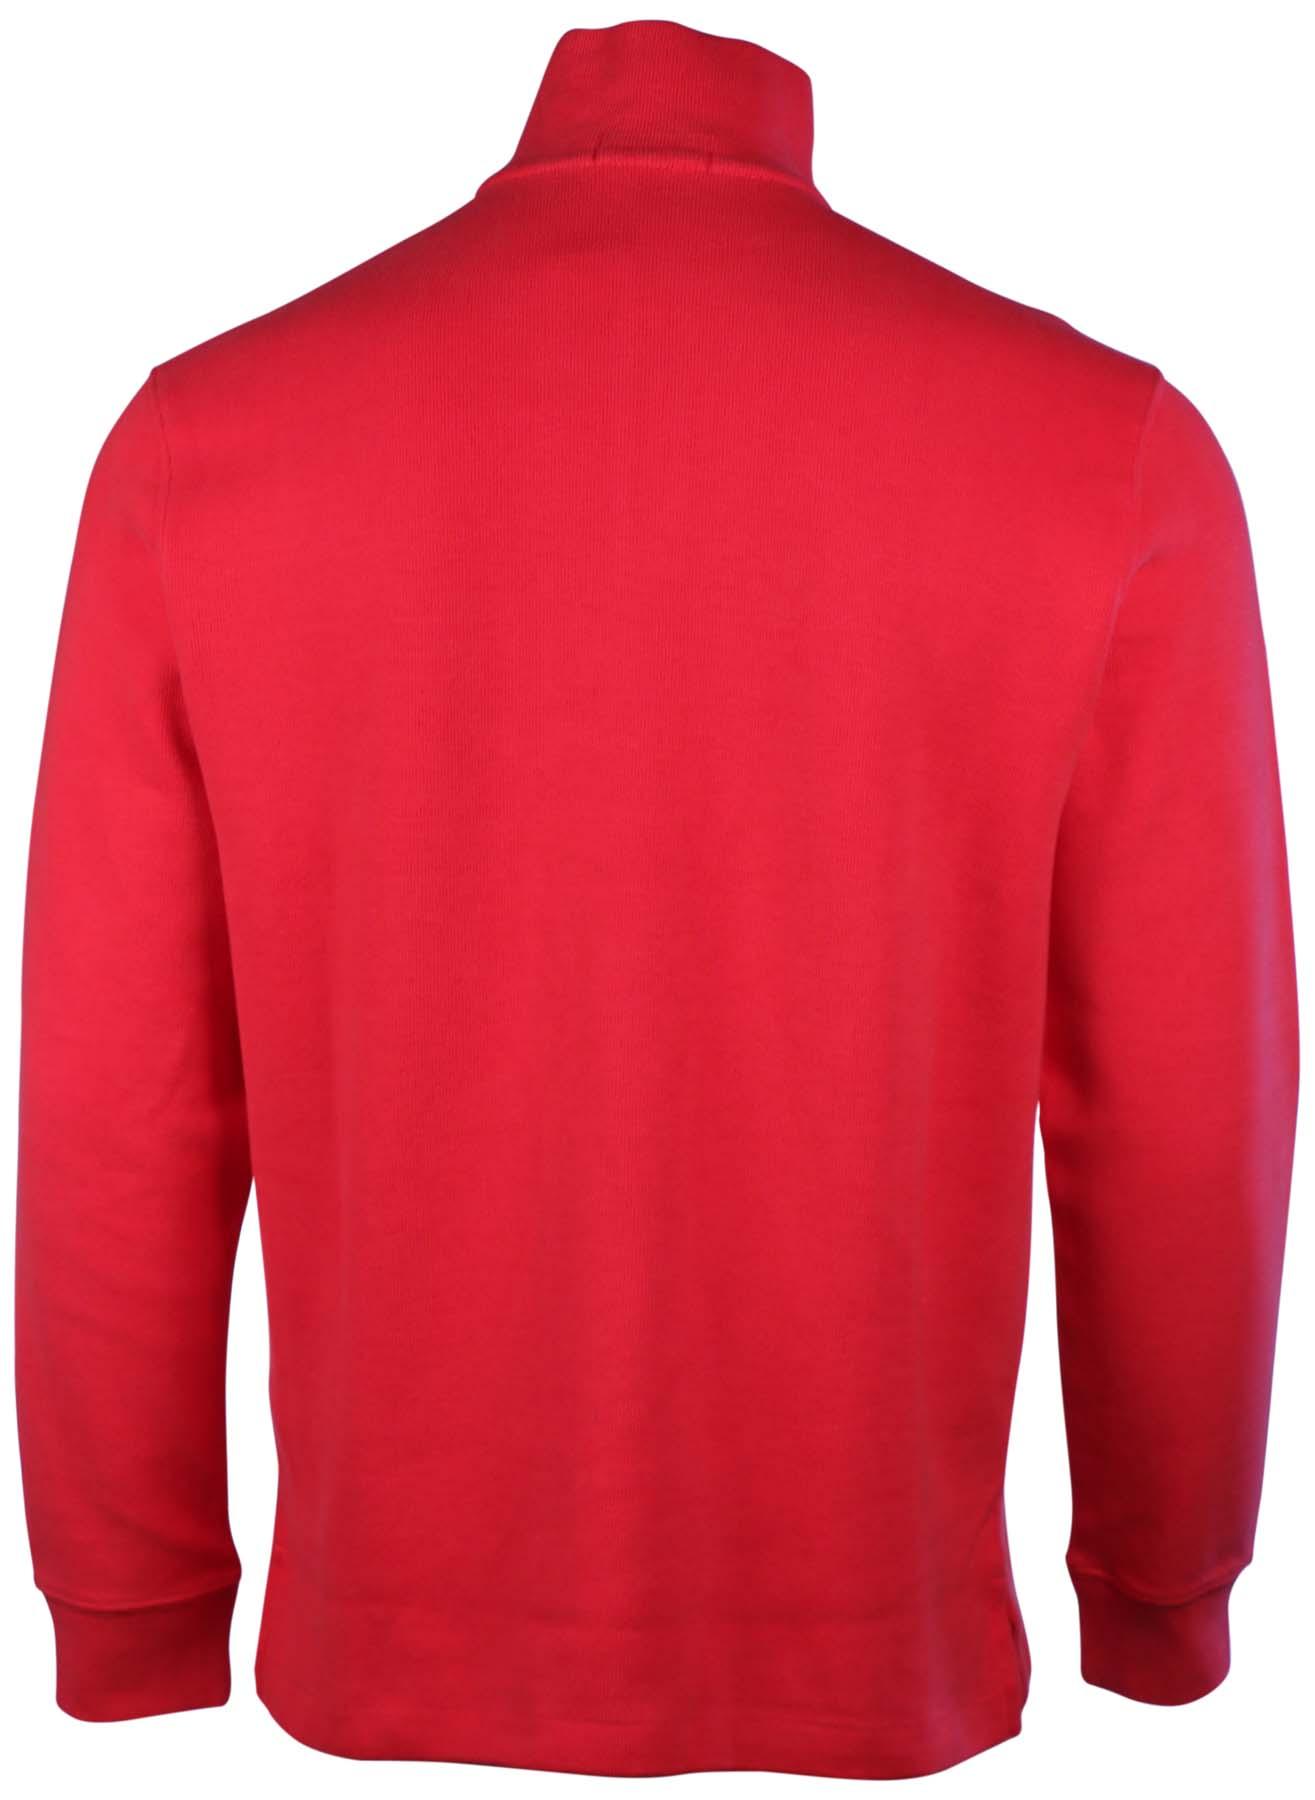 details about polo ralph lauren men 39 s 1 2 zip pullover sweater. Black Bedroom Furniture Sets. Home Design Ideas